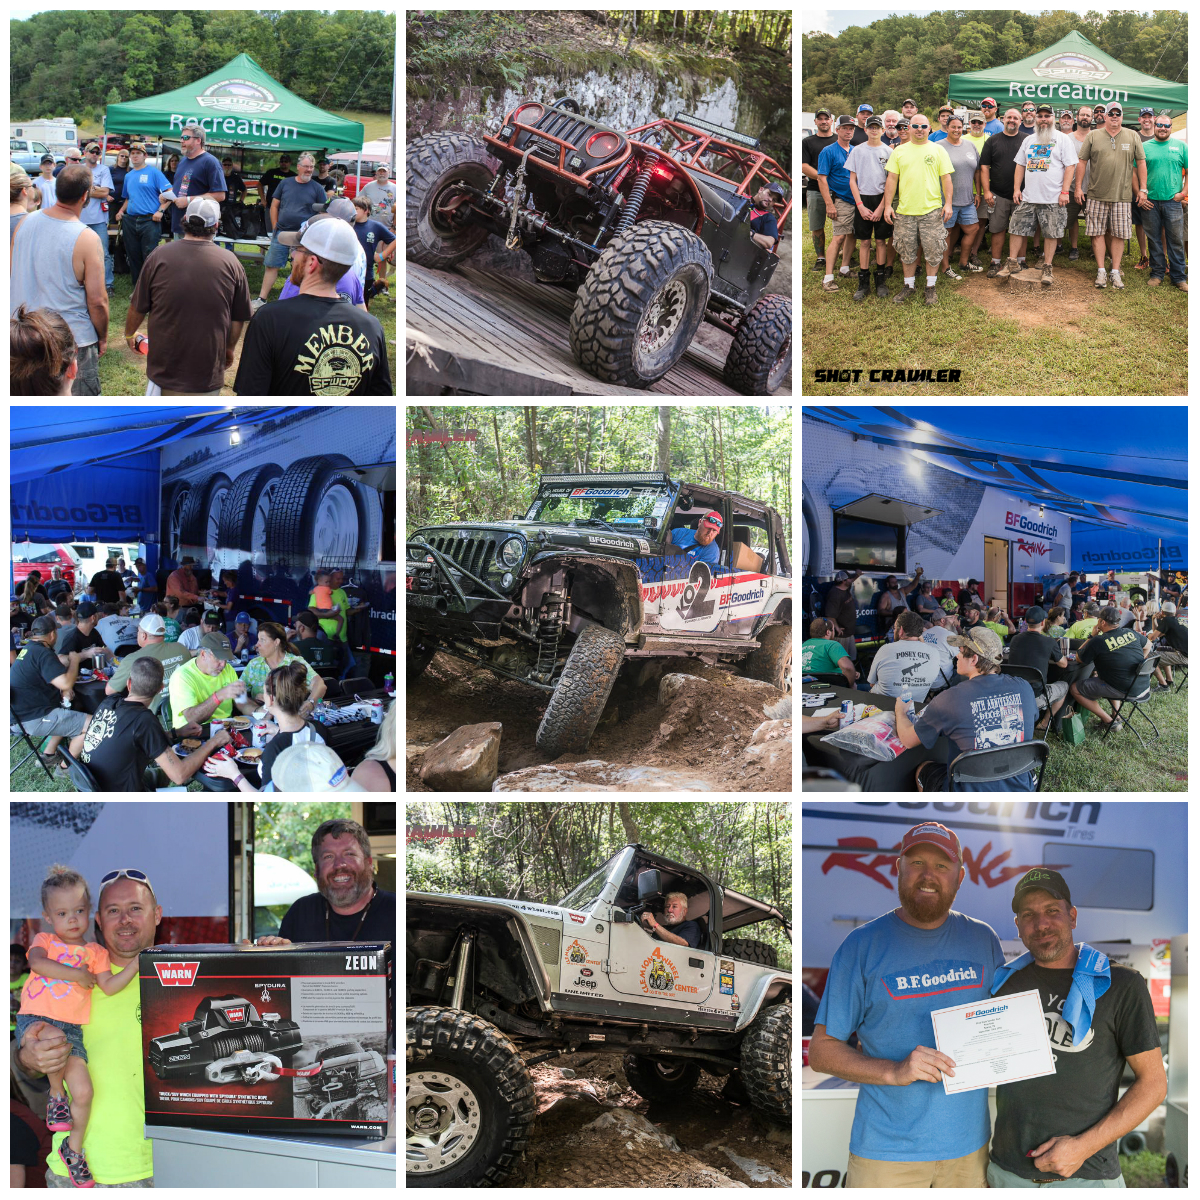 Premium Ride Group 2016 - Dixie Run